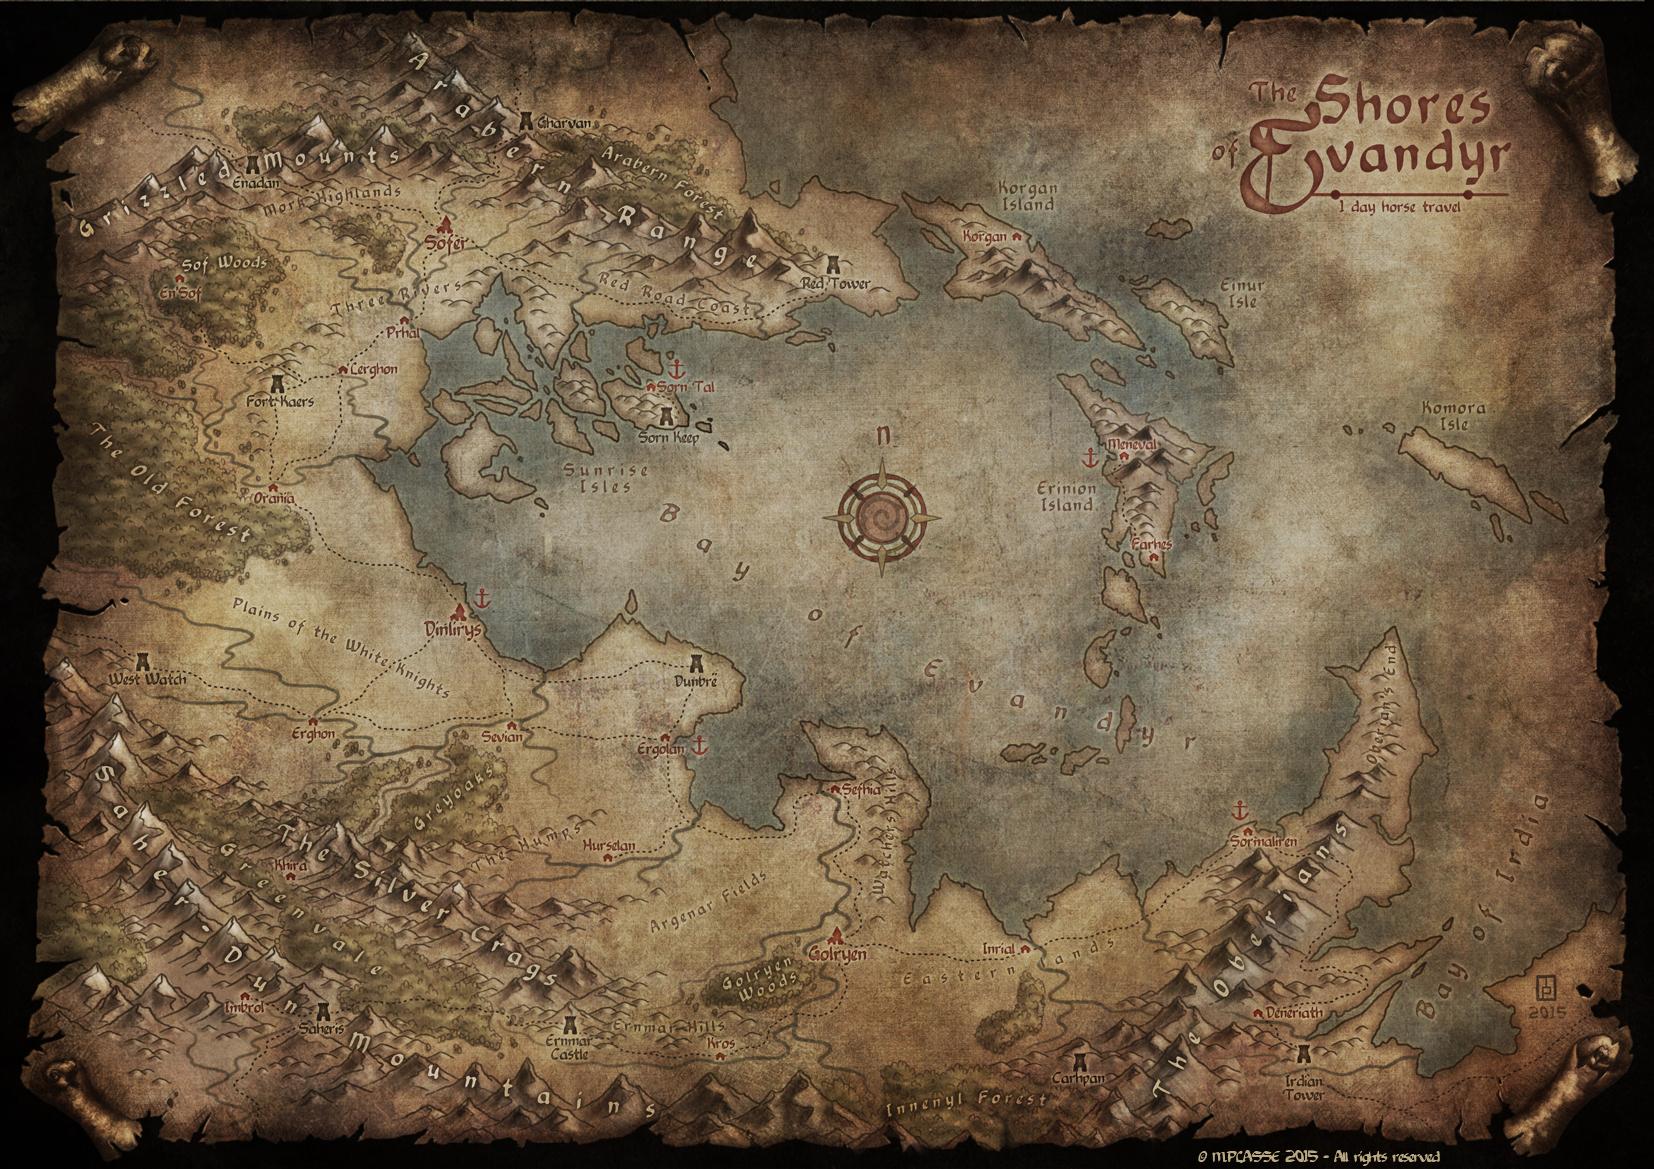 Shores of Evandyr